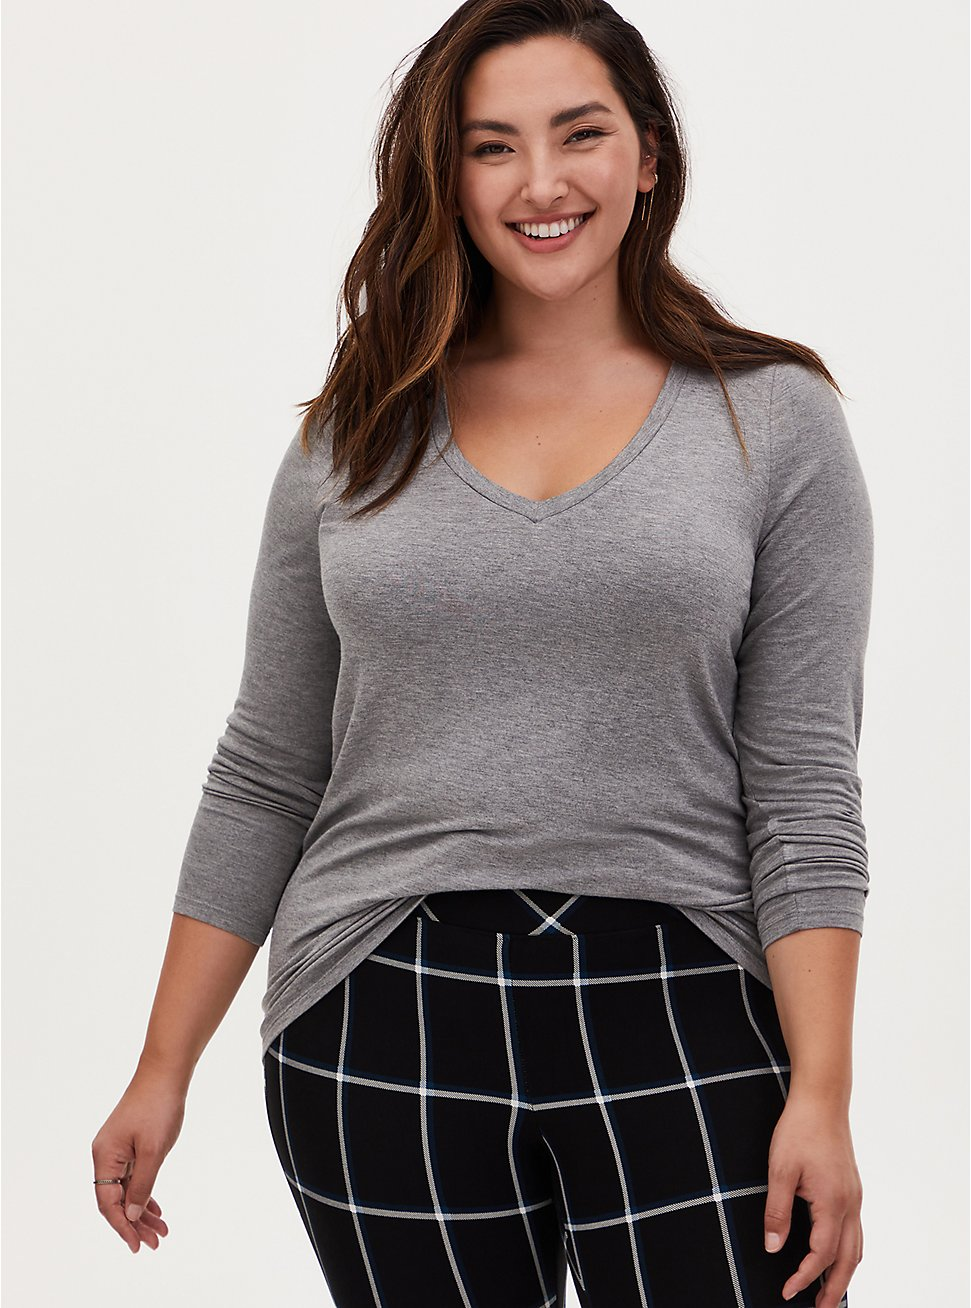 Long Sleeve V-Neck Tee - Super Soft Heather Grey , HEATHER GREY, hi-res